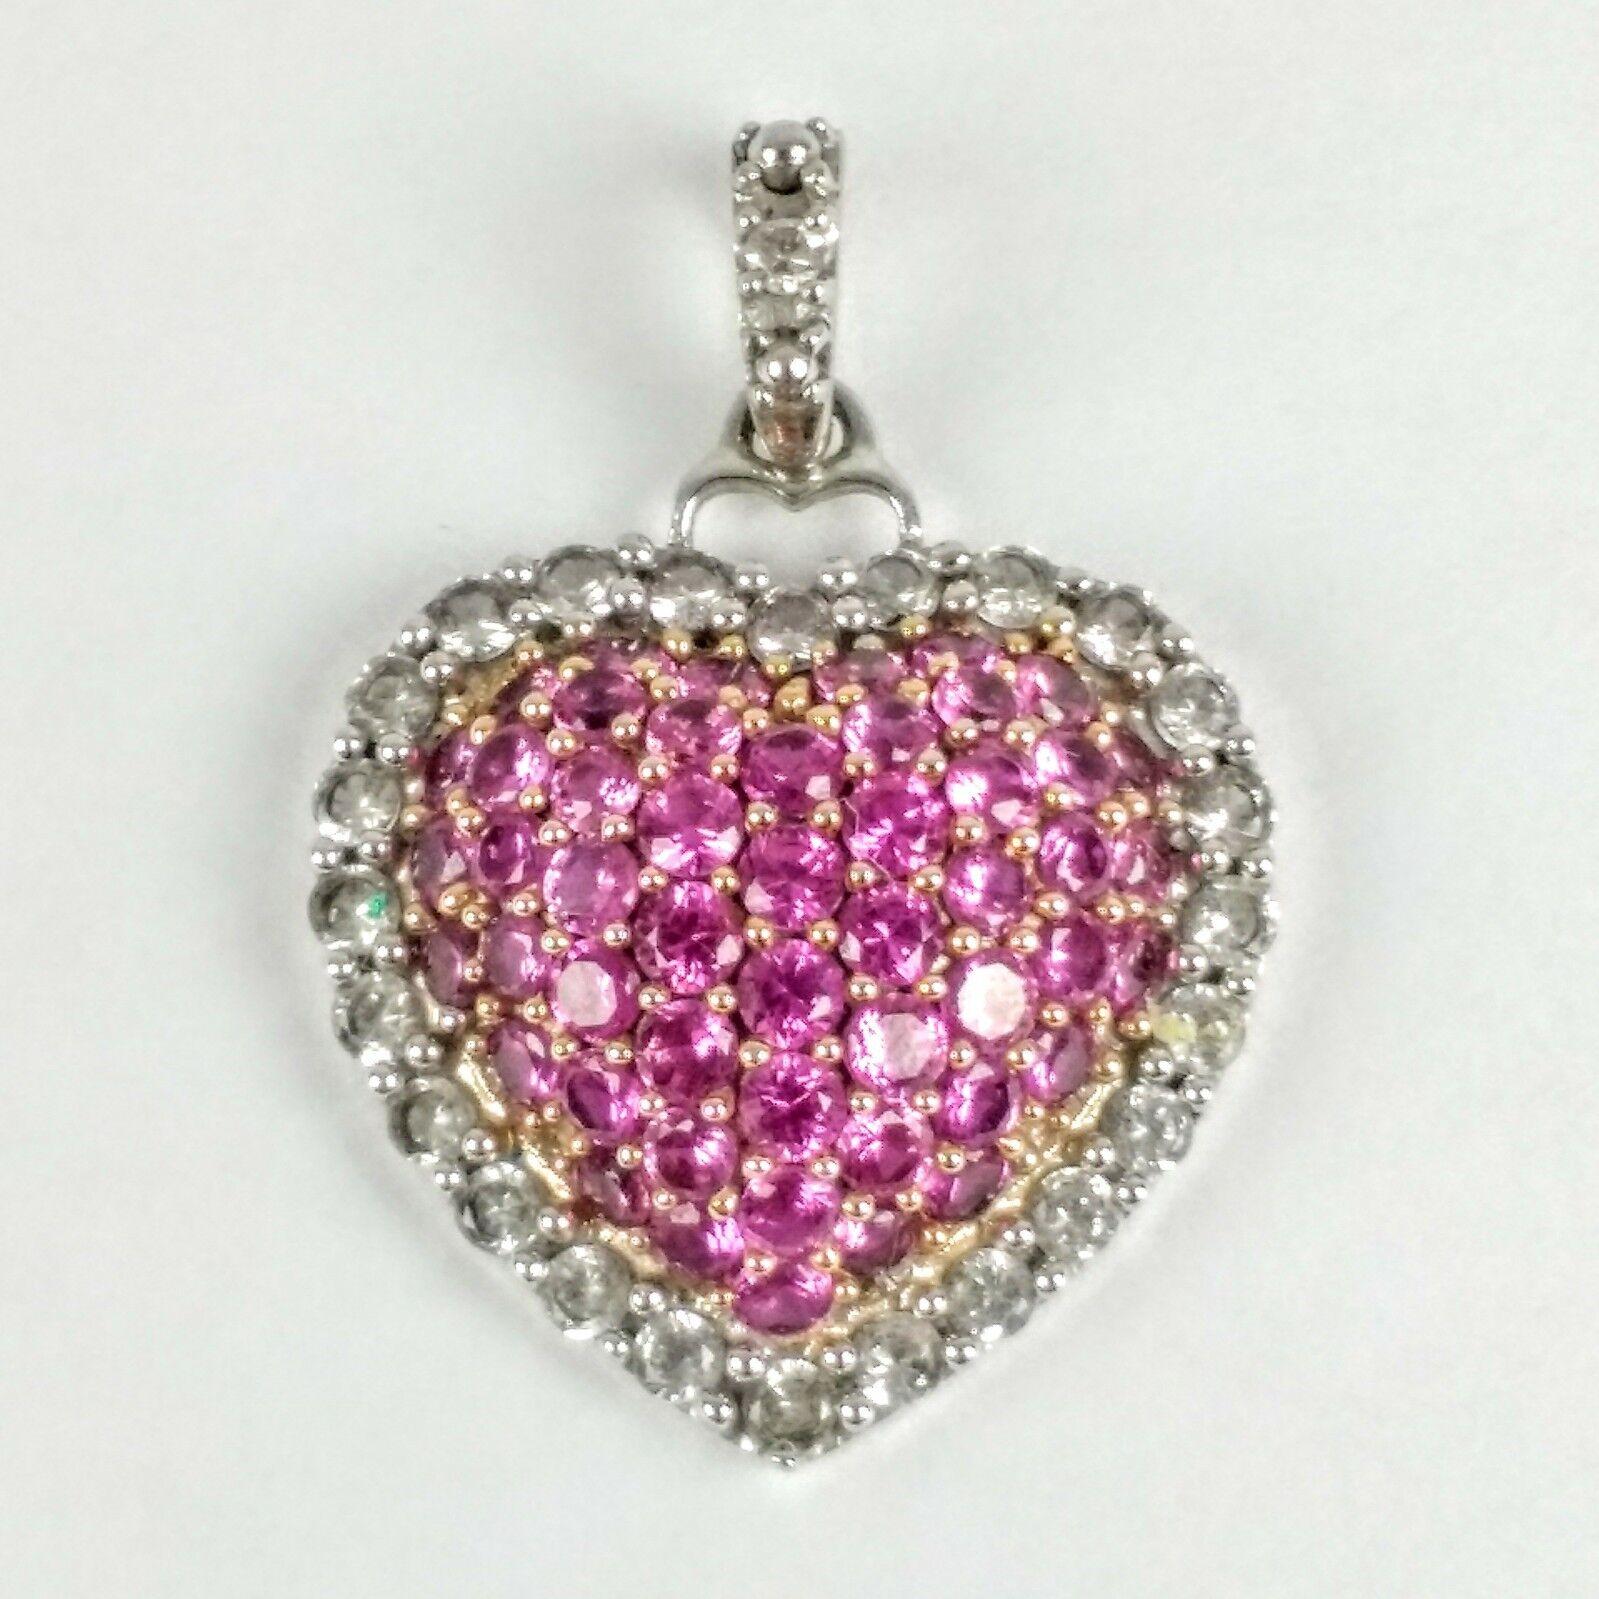 Alwand Vahan 10K White gold Hot Pink Stones Diamonds Pave Heart Pendant 2.05 gm